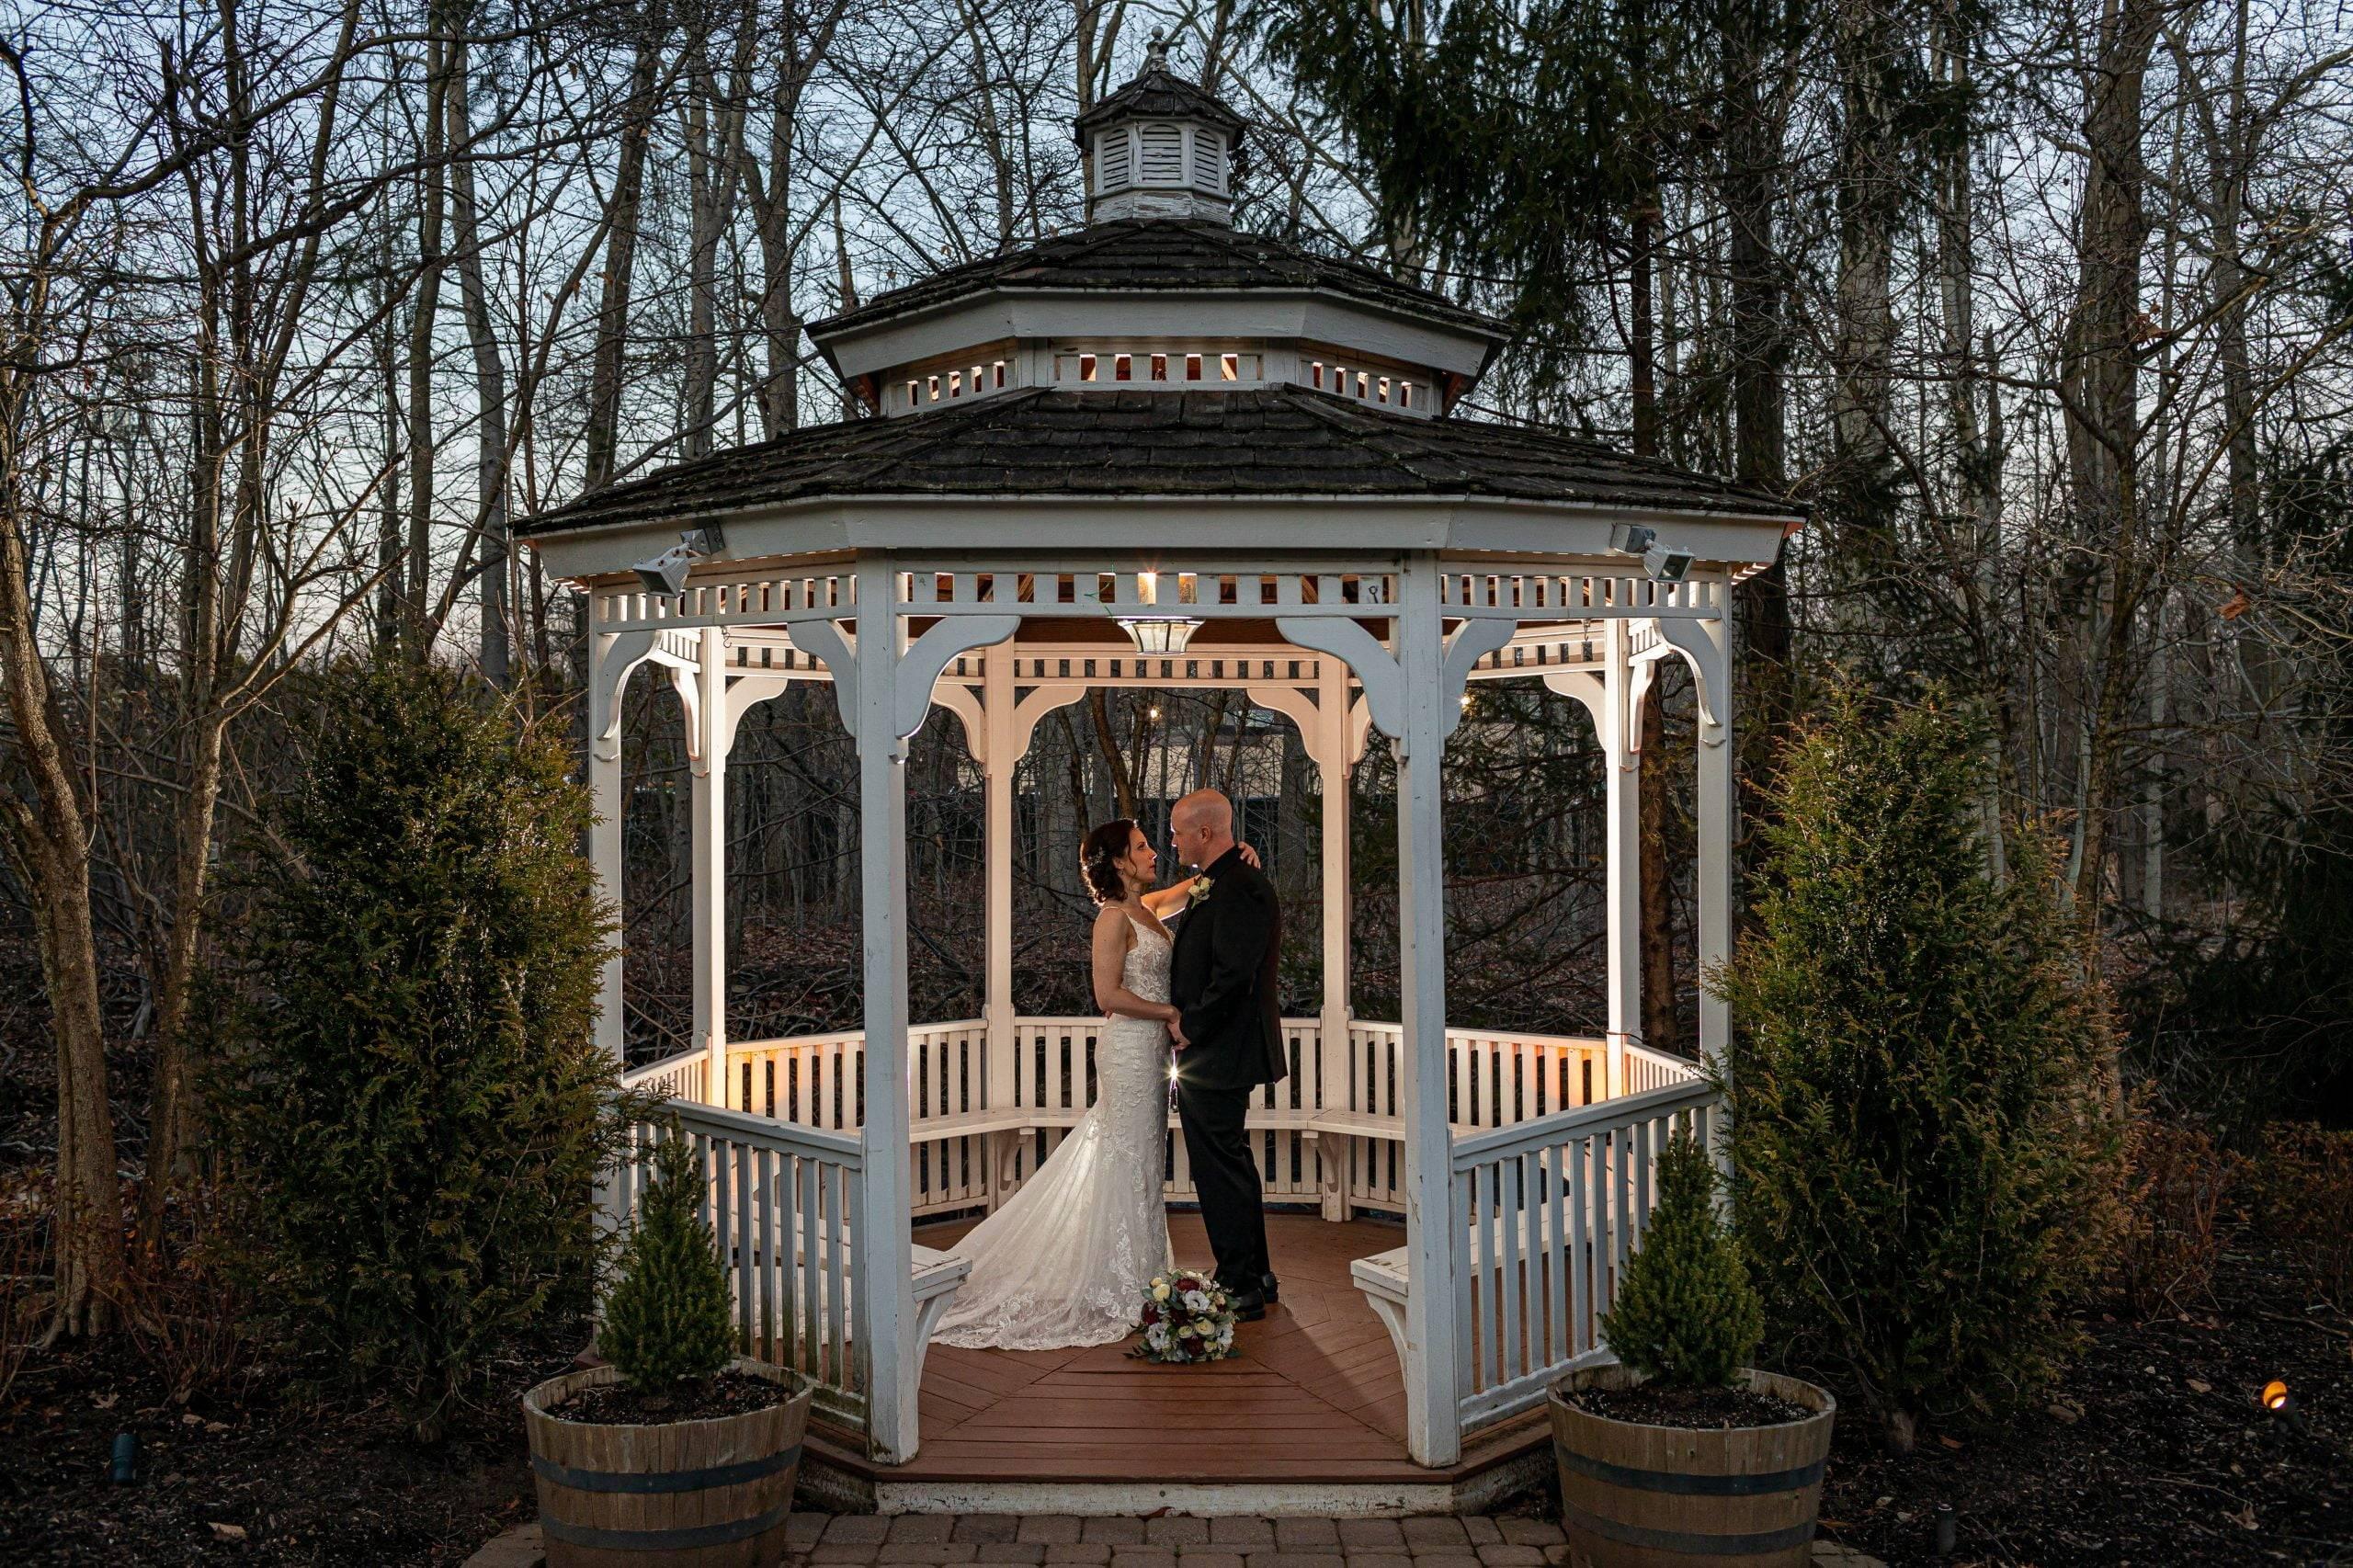 Olde Mill Inn bride and groom in the gazebo